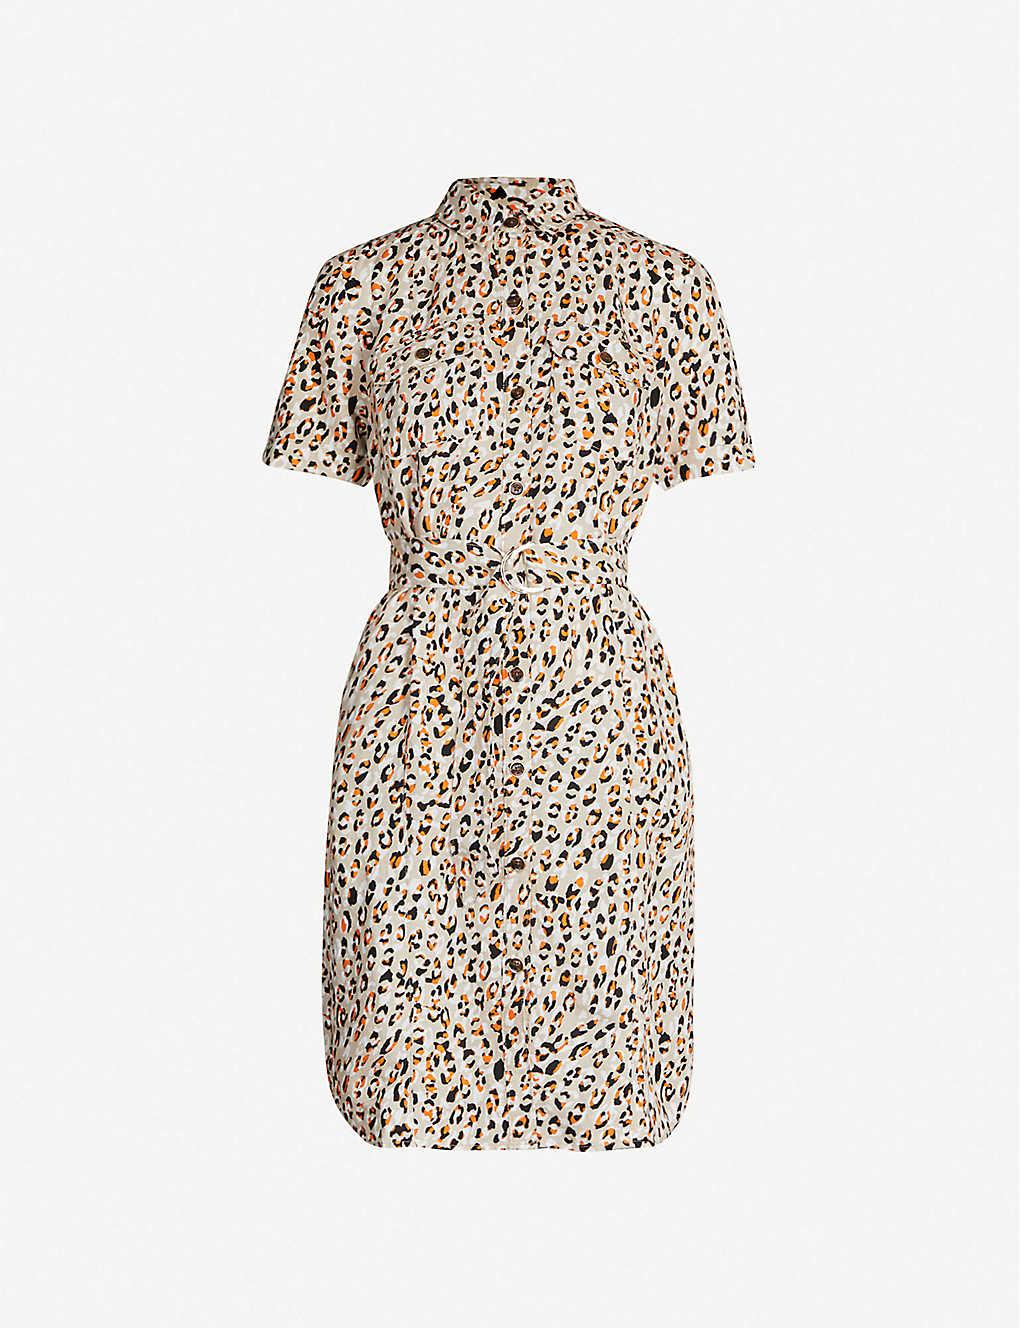 ea36c5b31583 KAREN MILLEN - Leopard-print collared linen-blend mini dress ...